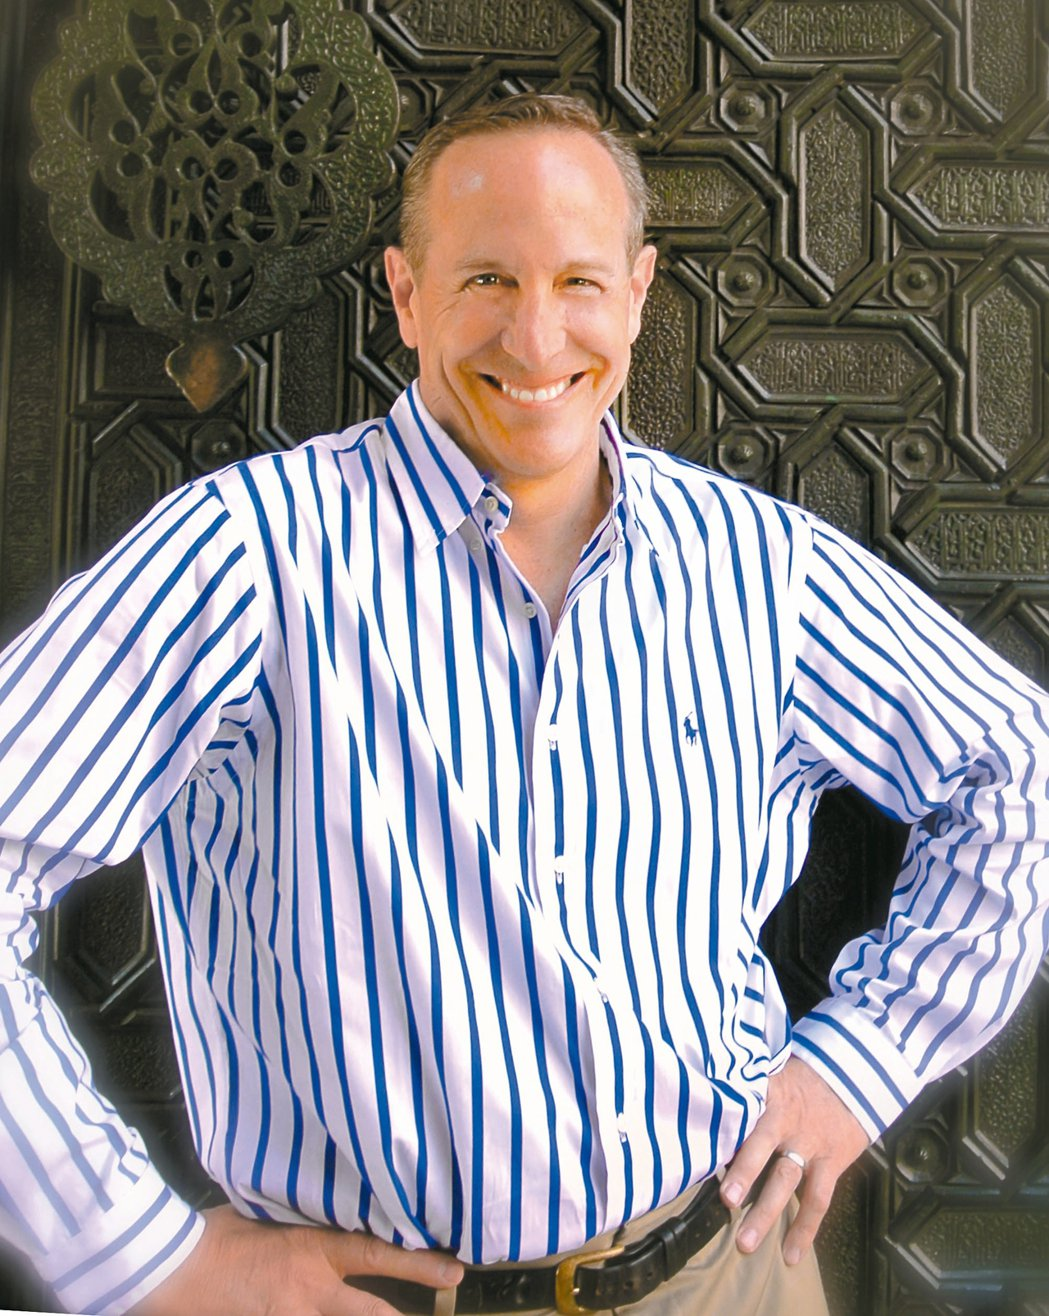 Bill Bensley定居曼谷,擅長用飯店說故事。 圖/BENSLEY提供